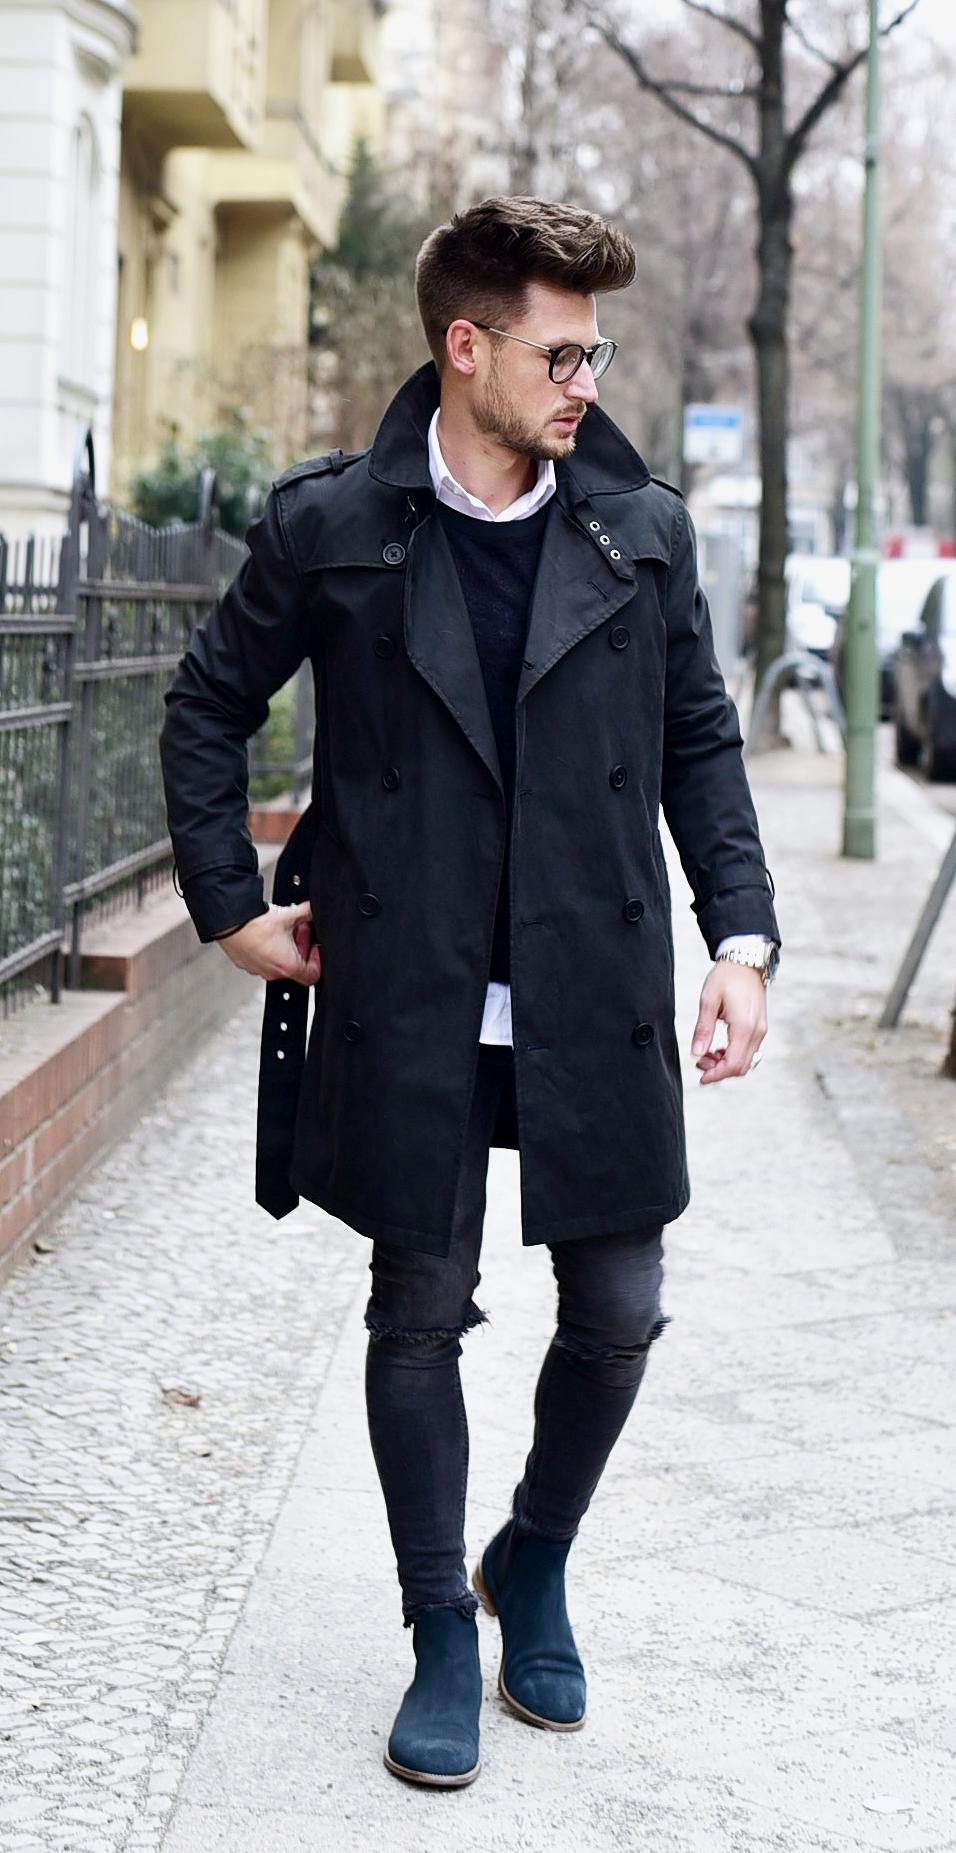 Tommeezjerry-Styleblog-Männerblog-Männer-Modeblog-Berlin-Berlinblog-Männermodeblog-Outfit-Coat-Trenchcoat-Bruno-Banani-Chelsea-Boots-Otto